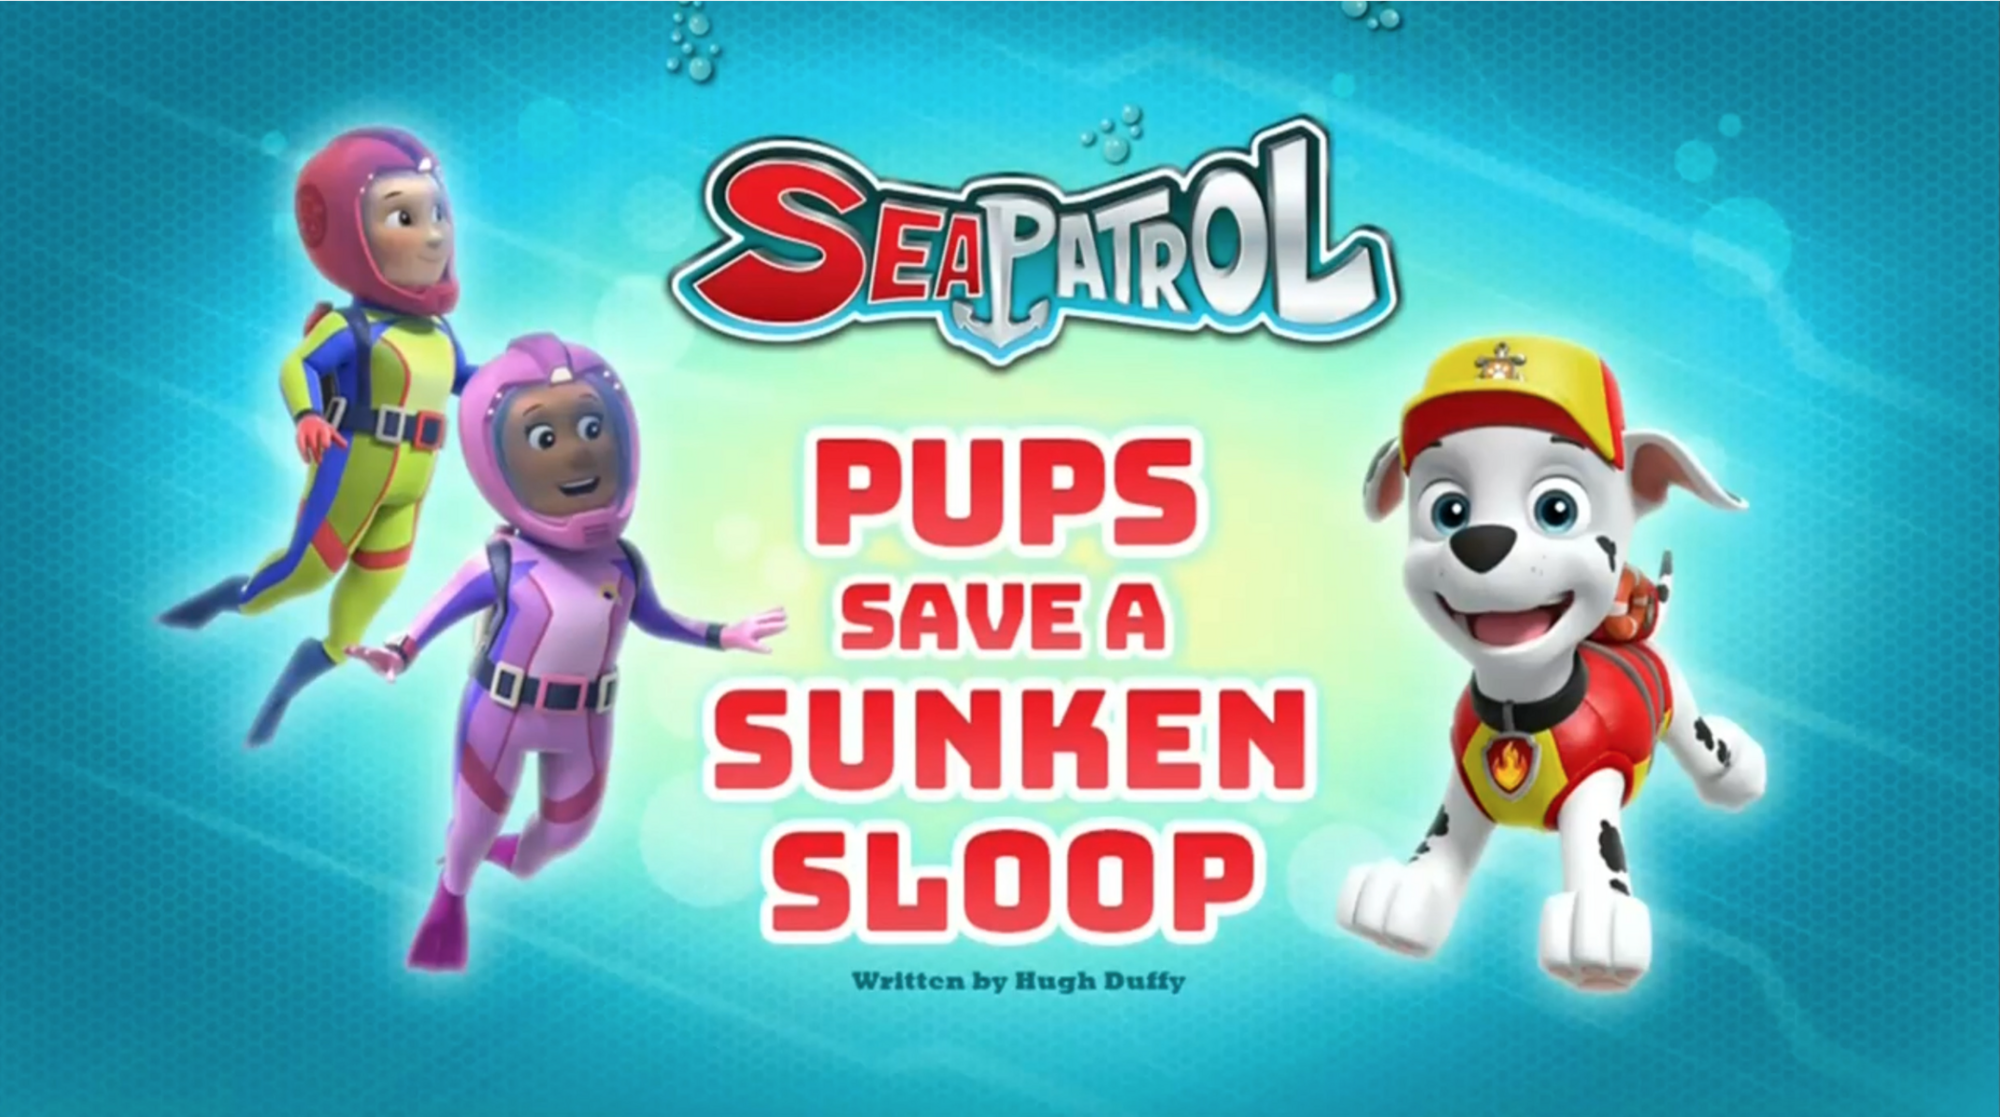 8bf7401f03 Sea Patrol: Pups Save a Sunken Sloop | PAW Patrol Wiki | FANDOM powered by  Wikia